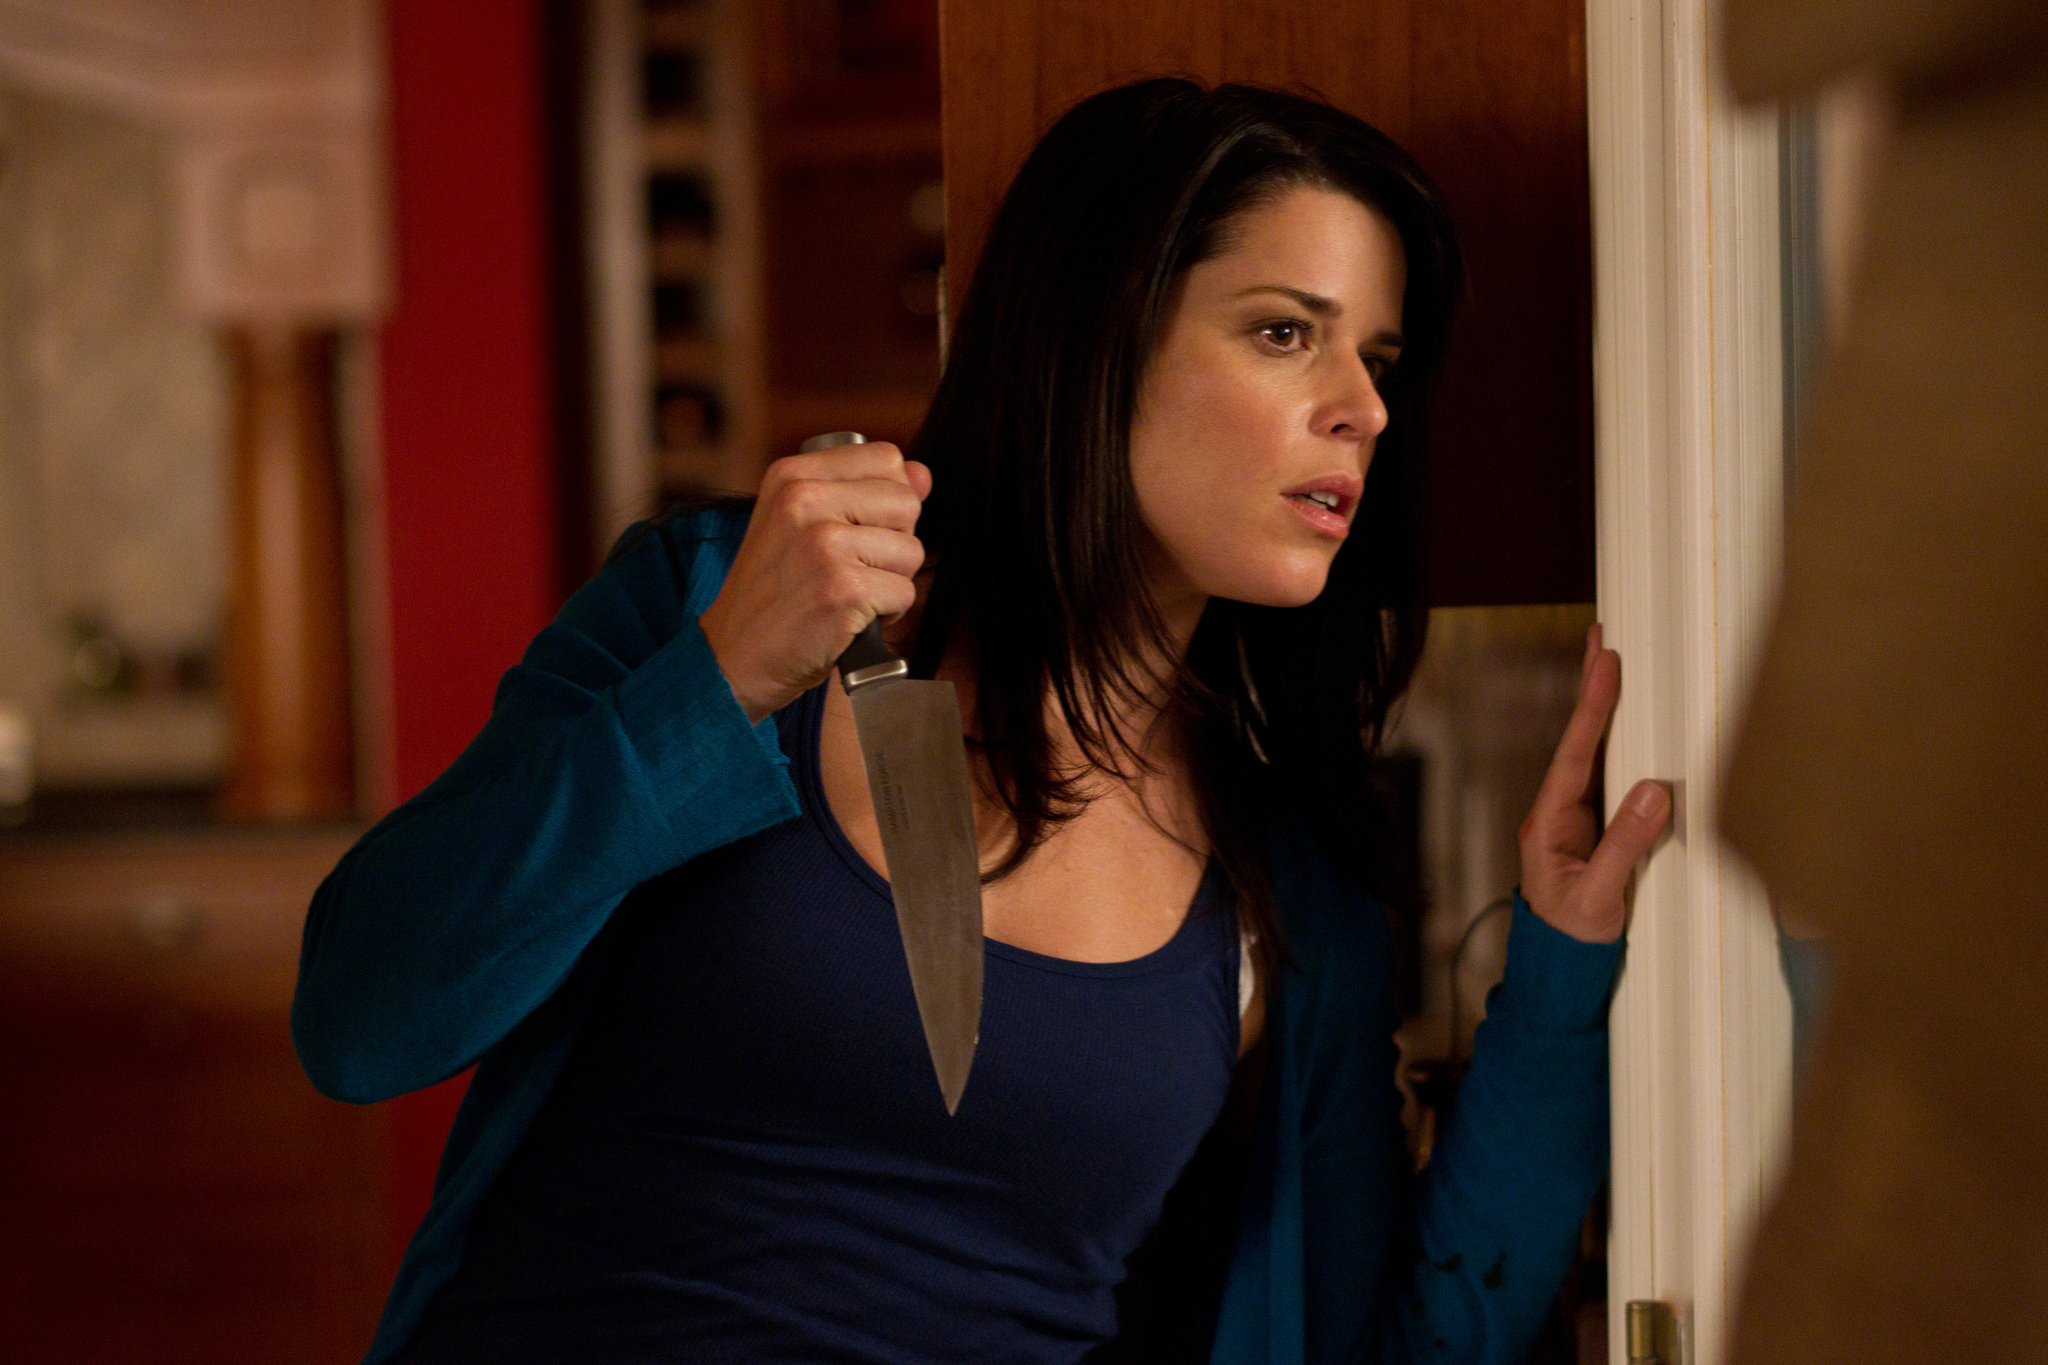 Comment Scream 5 essaye de garder la fin secrète jusqu'au bout